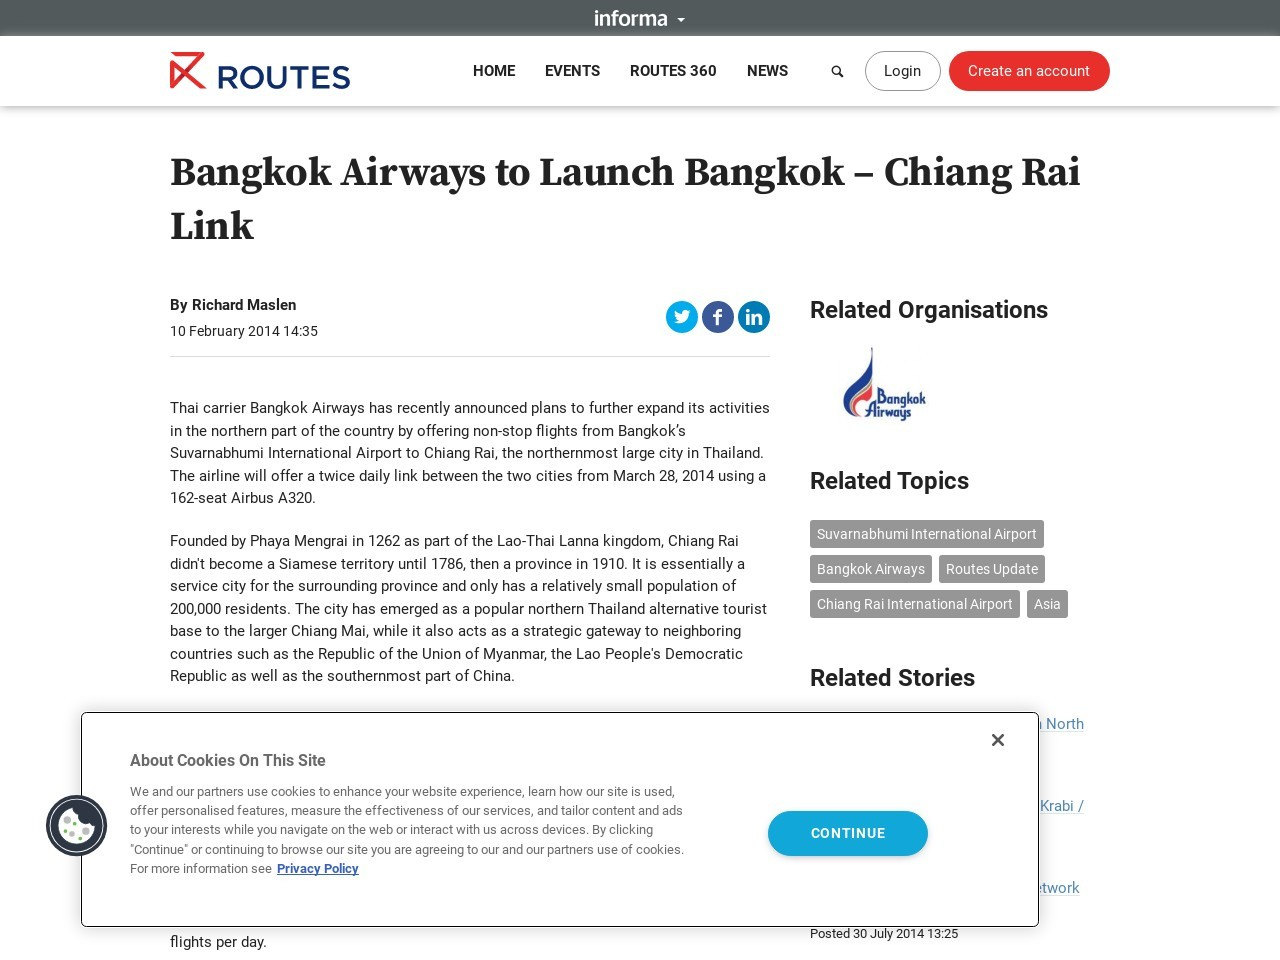 Bangkok Airways to Launch Bangkok – Chiang Rai Link …